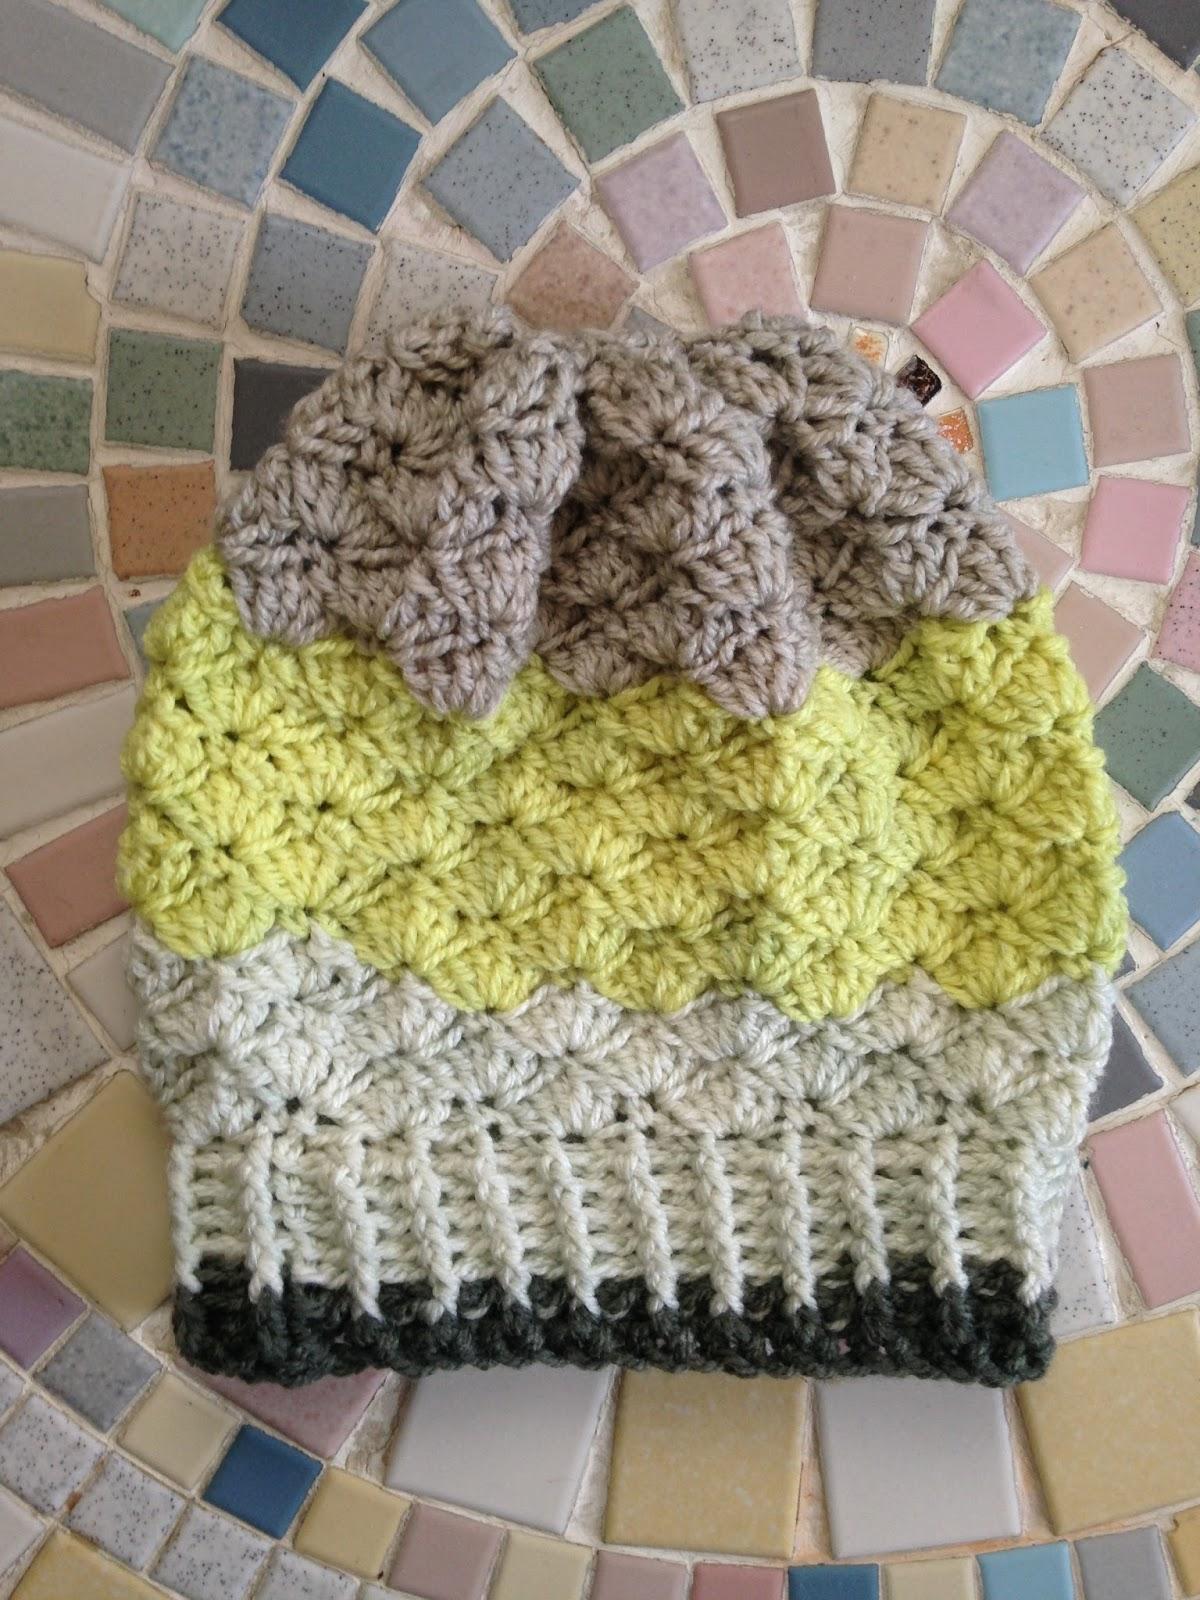 Anna's Crochet Spot: Simple Shells Slouchy Beanie